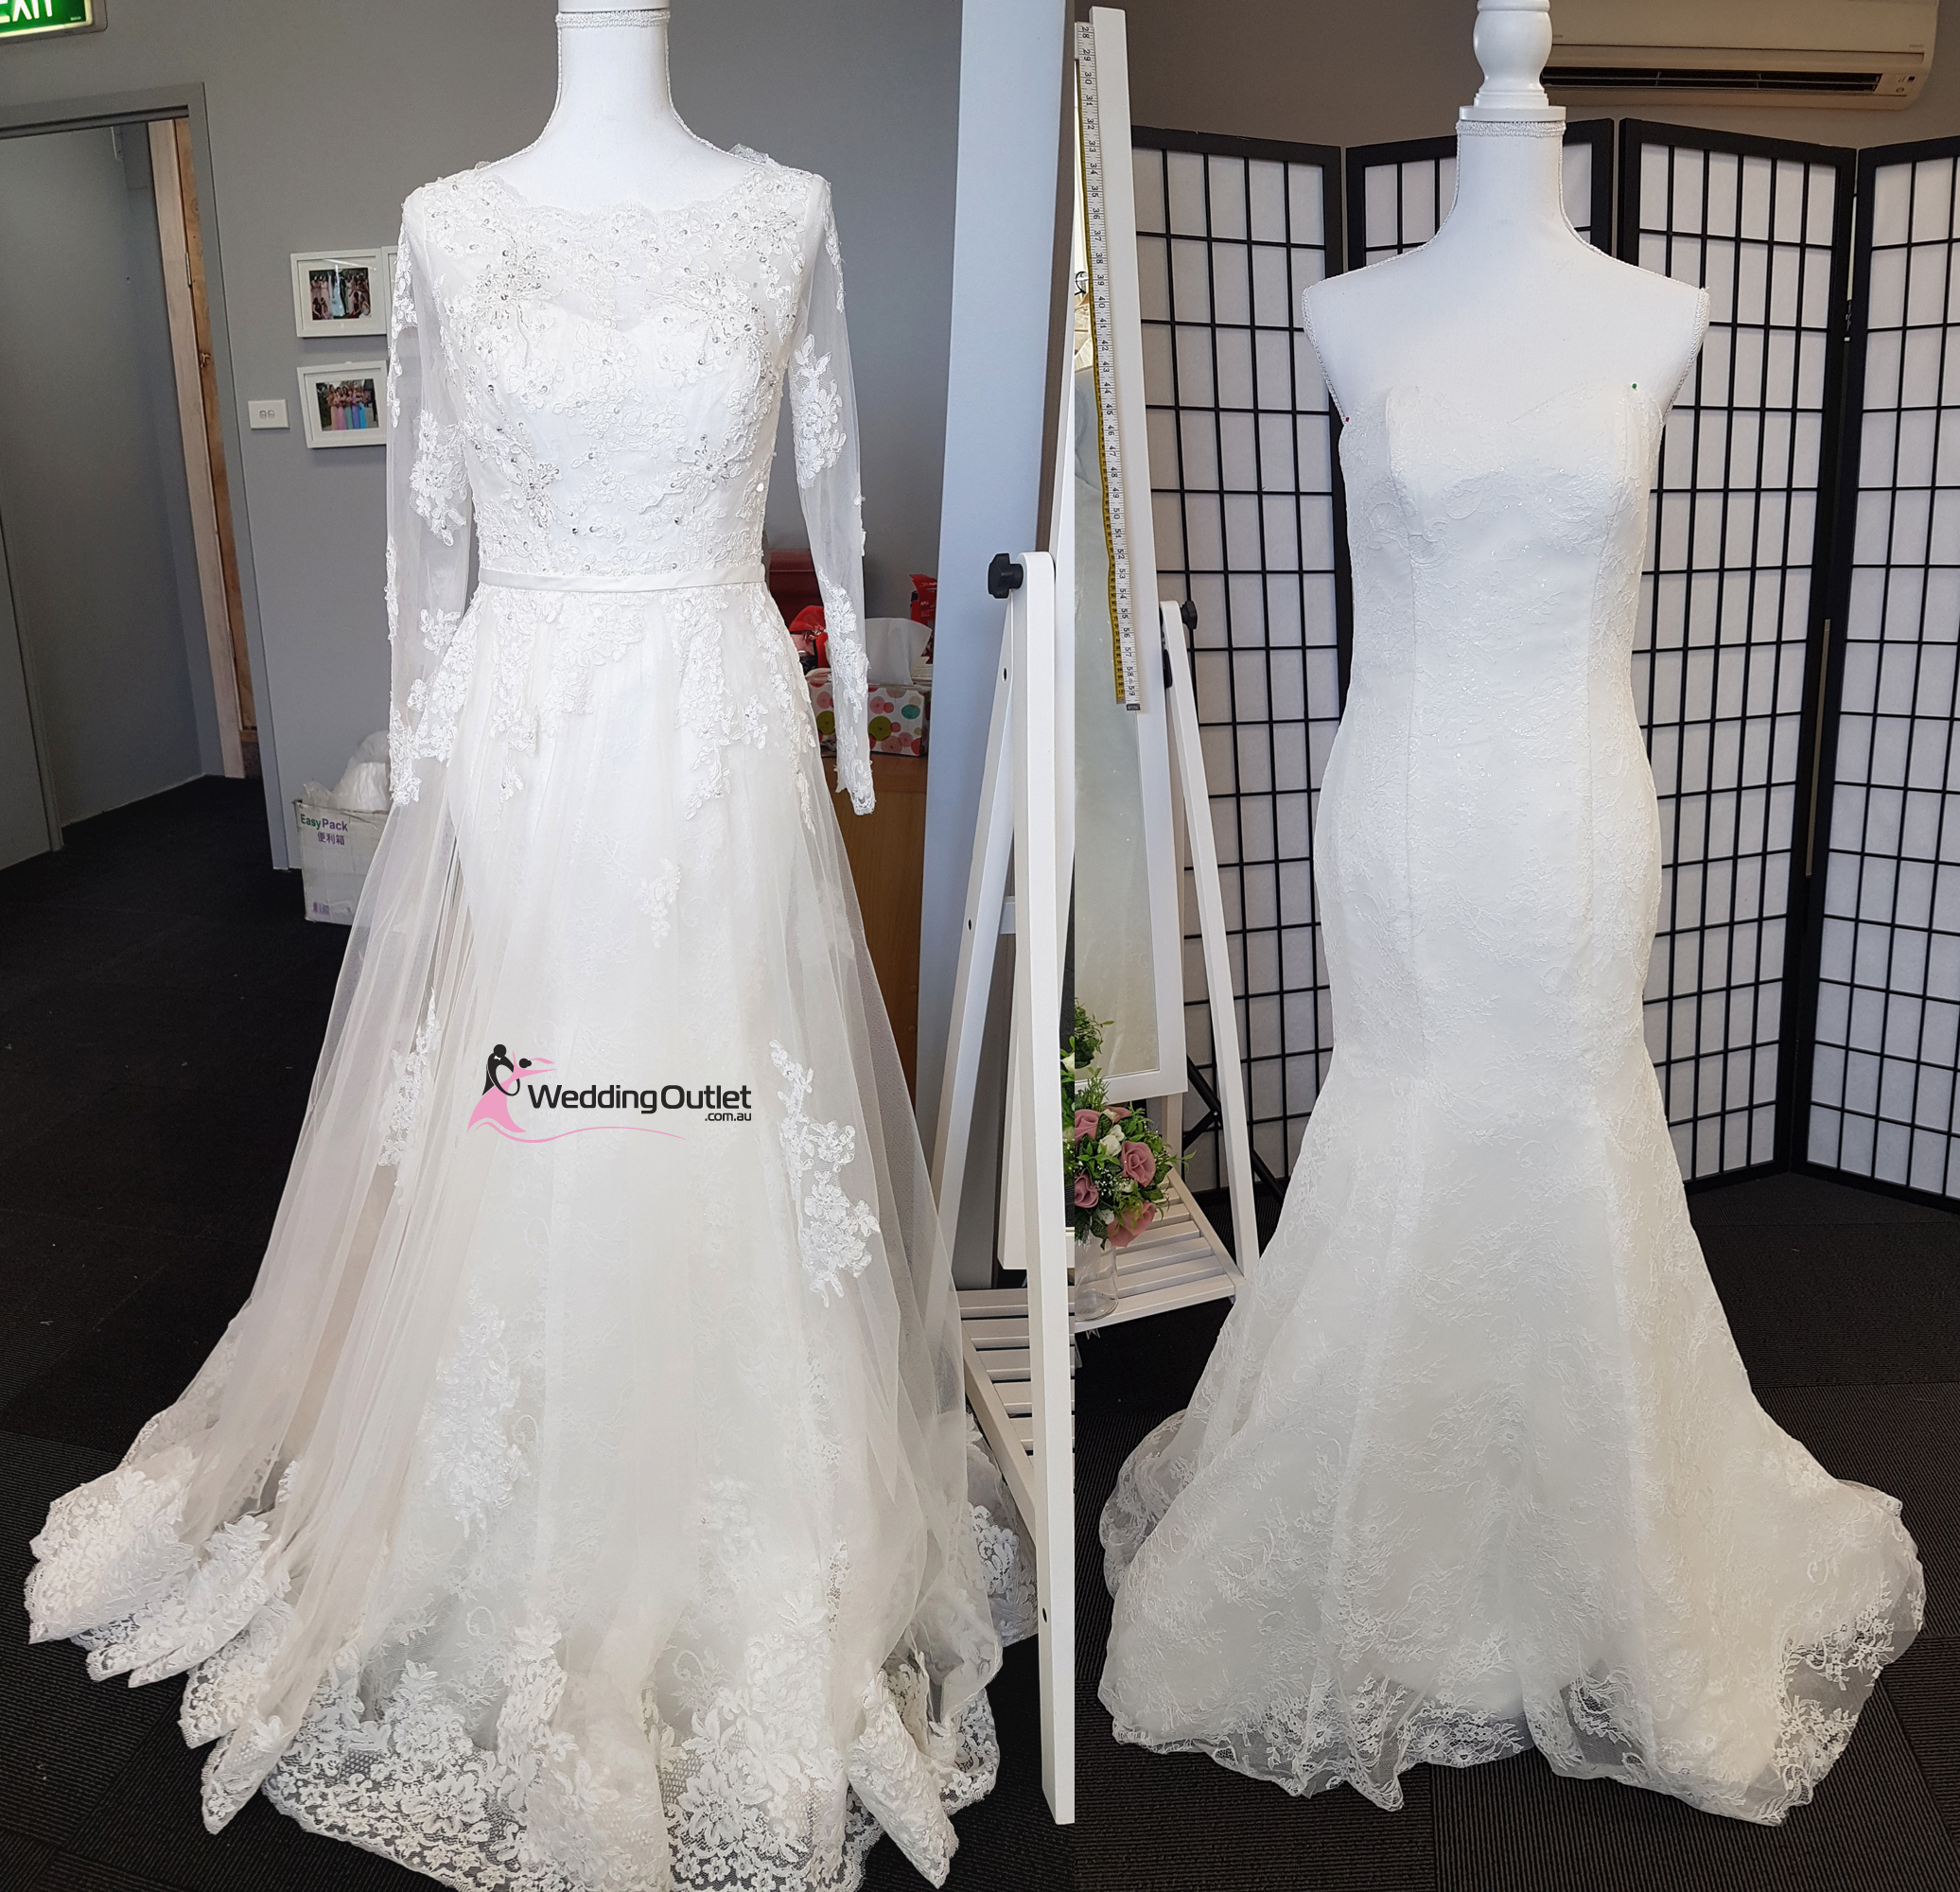 2 in 1 Wedding Dress Style Bridget Detachable Train - WeddingOutlet ...